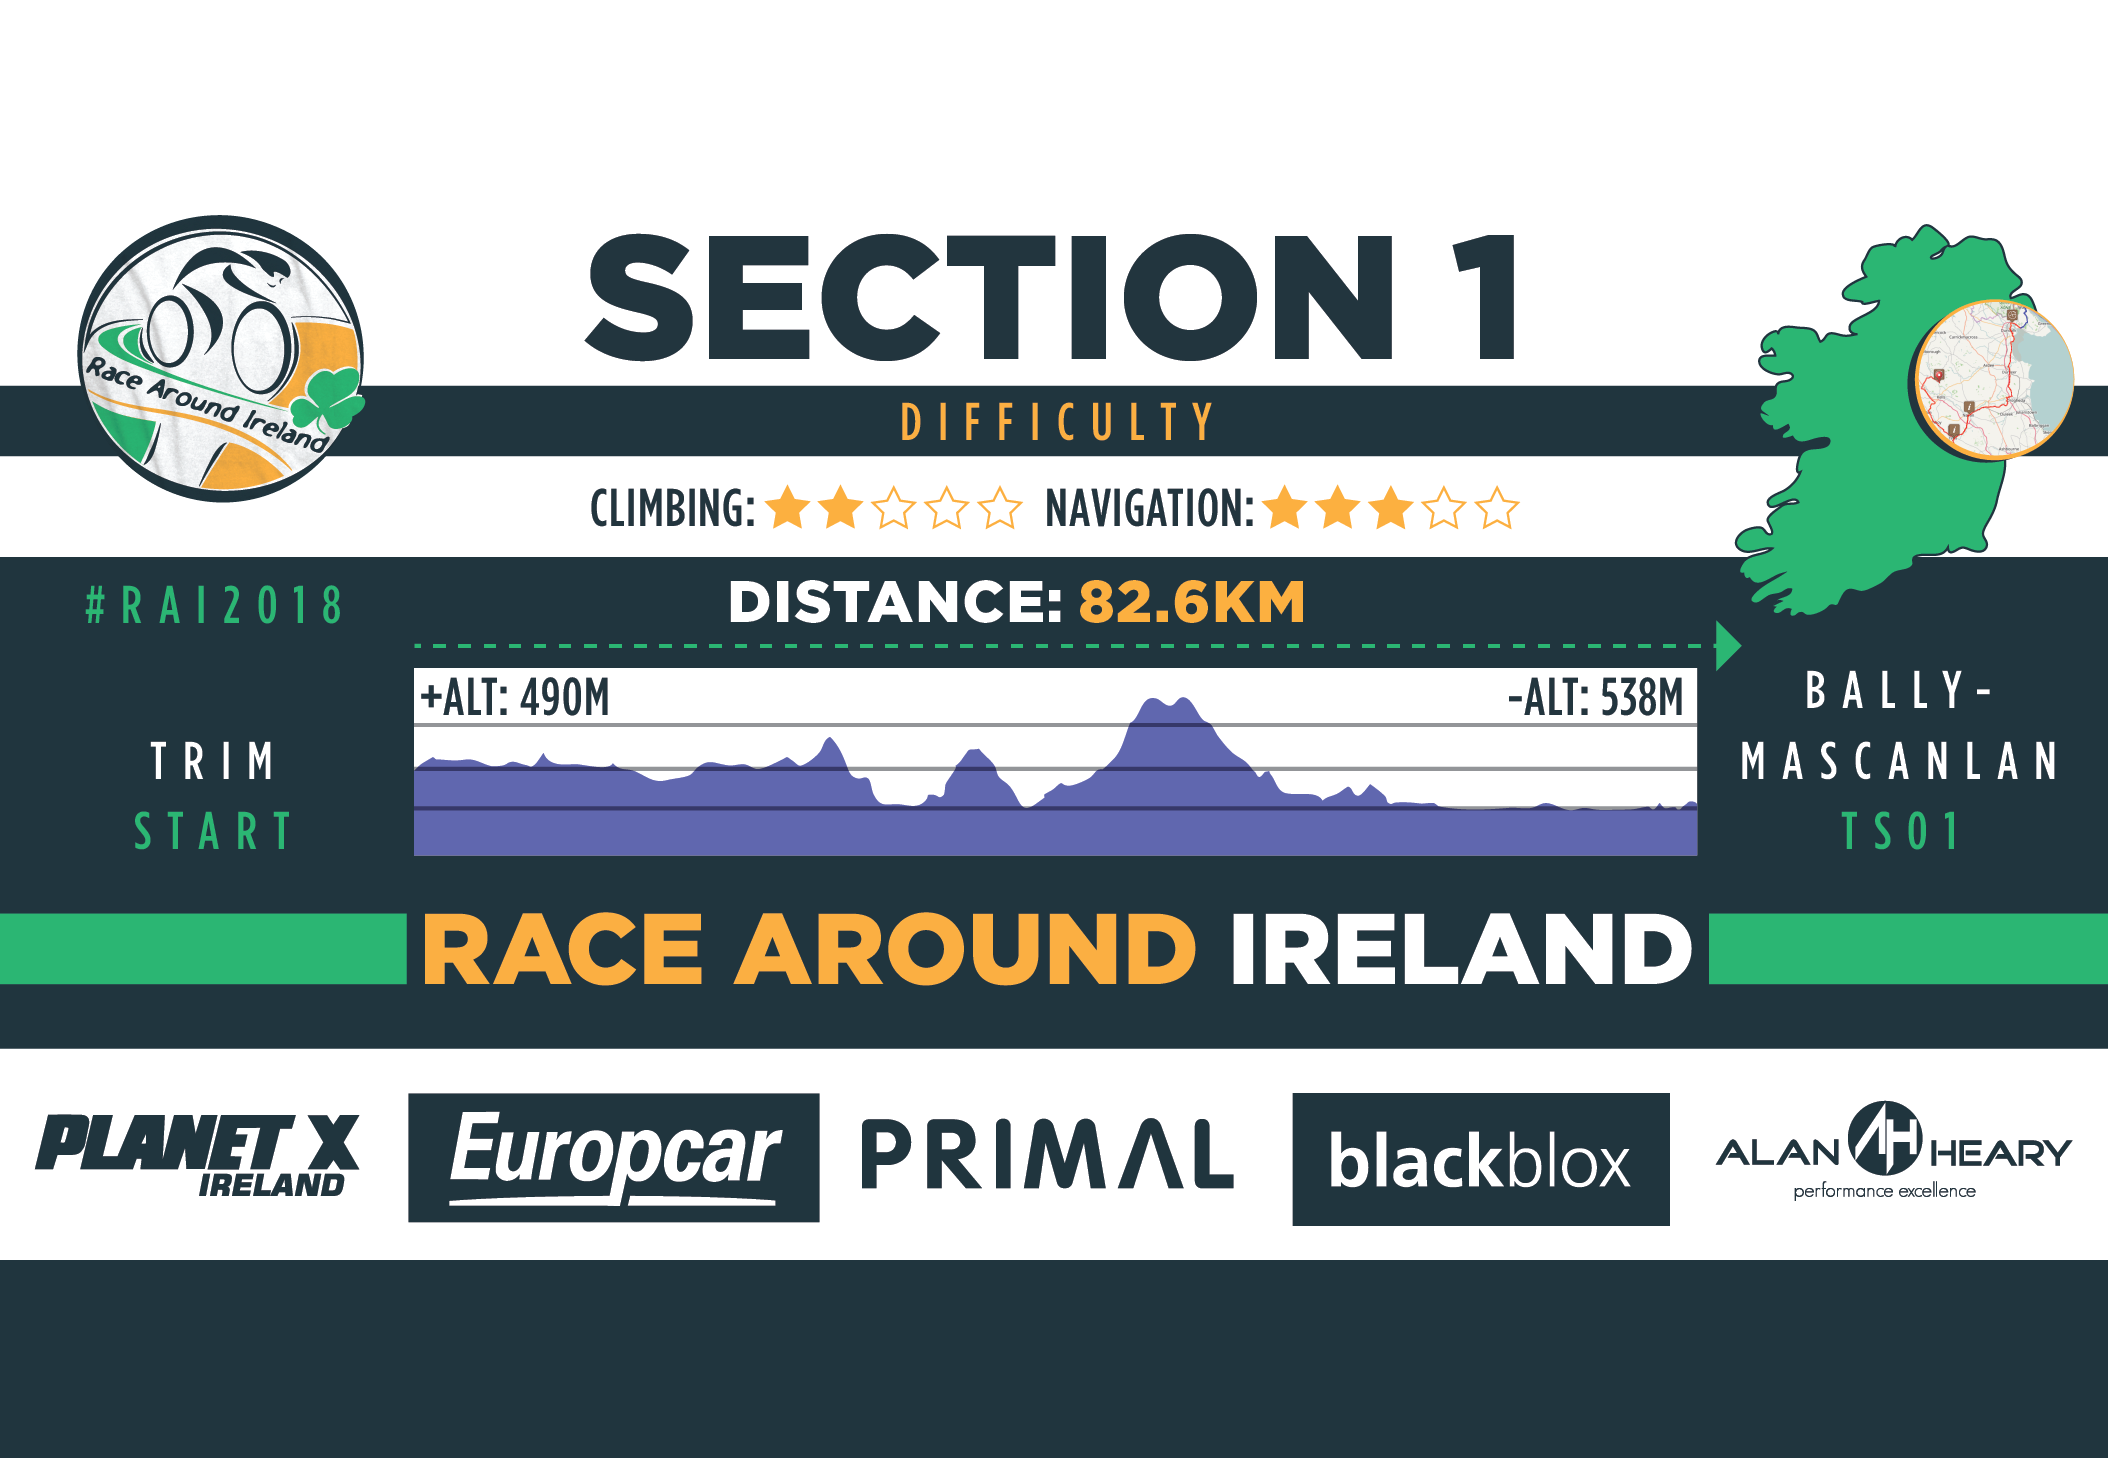 RAI 2018 SECTION_1.png